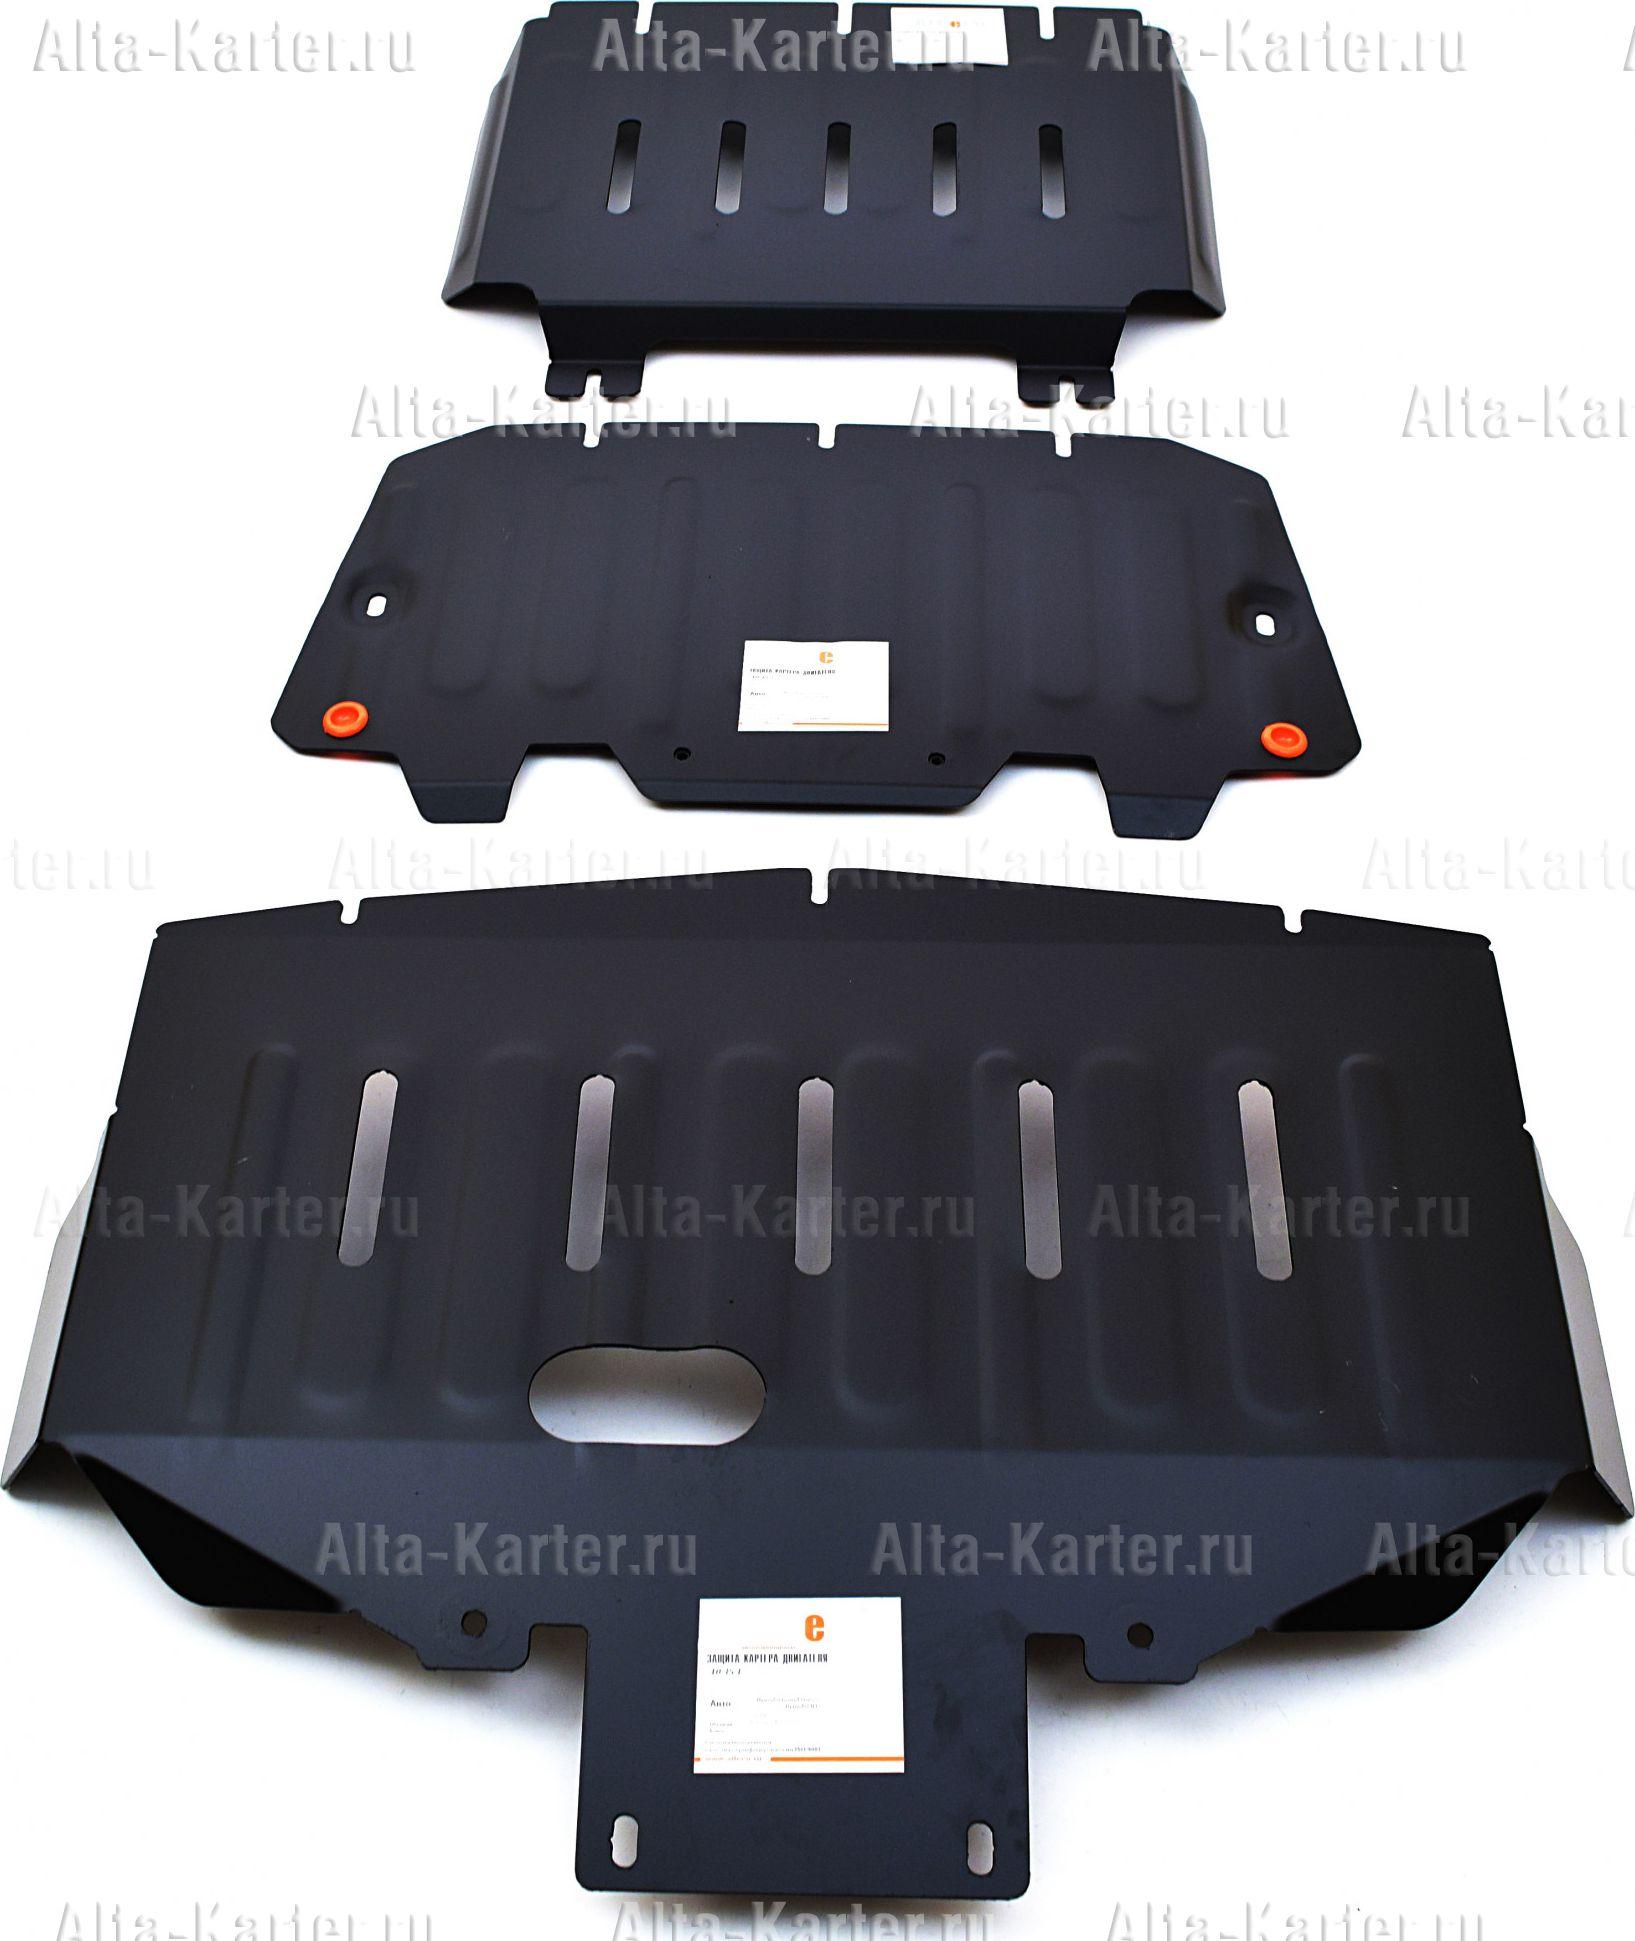 Защита Alfeco для картера и КПП Hyundai Grand Starex H1 RWD 2007-2021. Артикул ALF.10.35